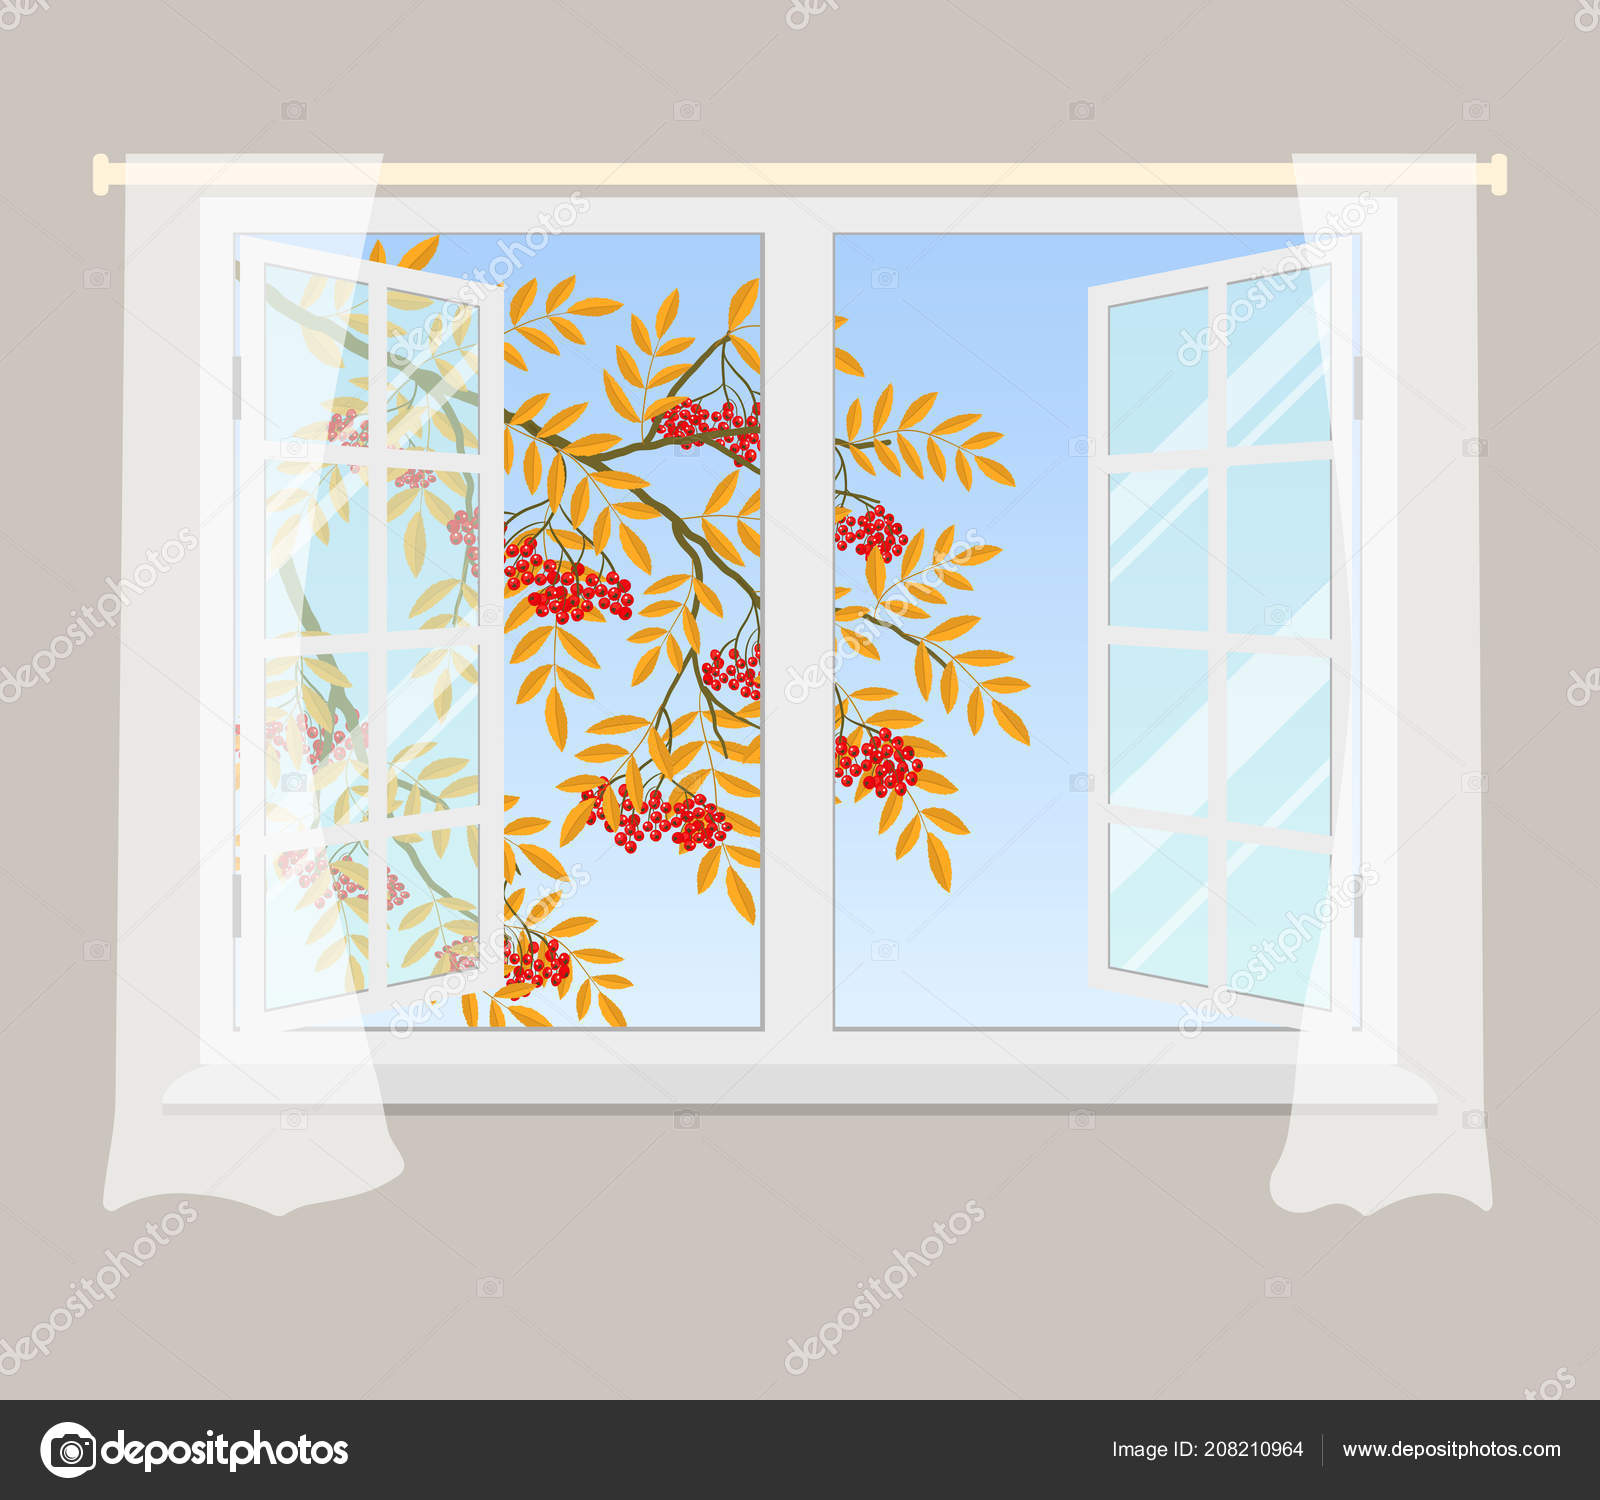 aa185586d Rowan Branch Window Red Berries Yellow Leaves Open Window Curtains — Stock  Vector